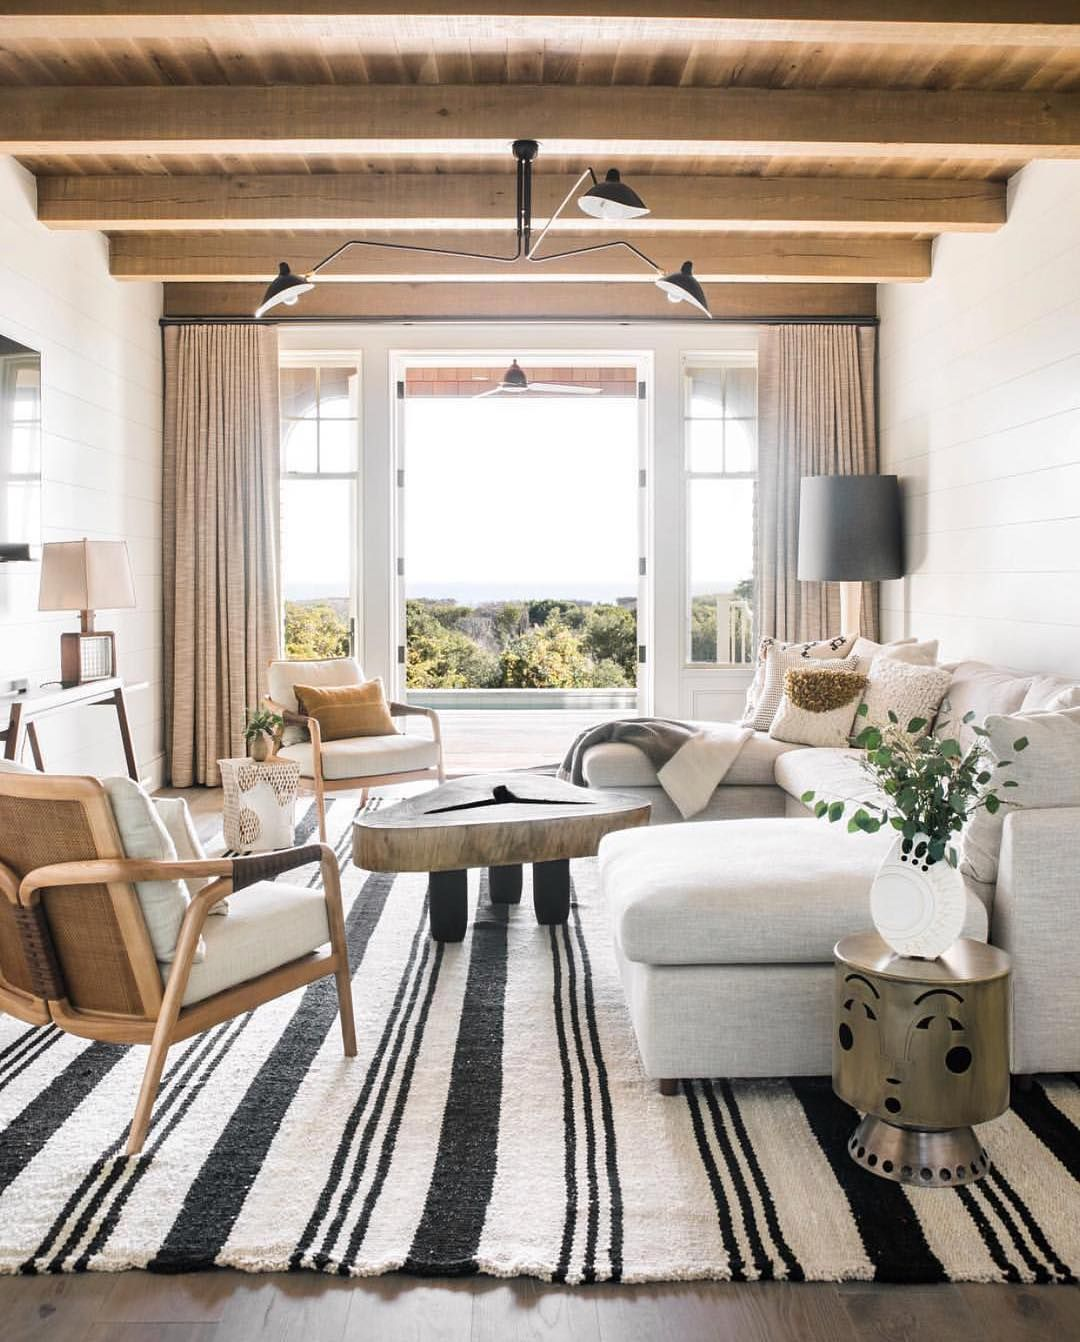 White Cottage Style Interiordesign: Black & White And Warm Wood Tones